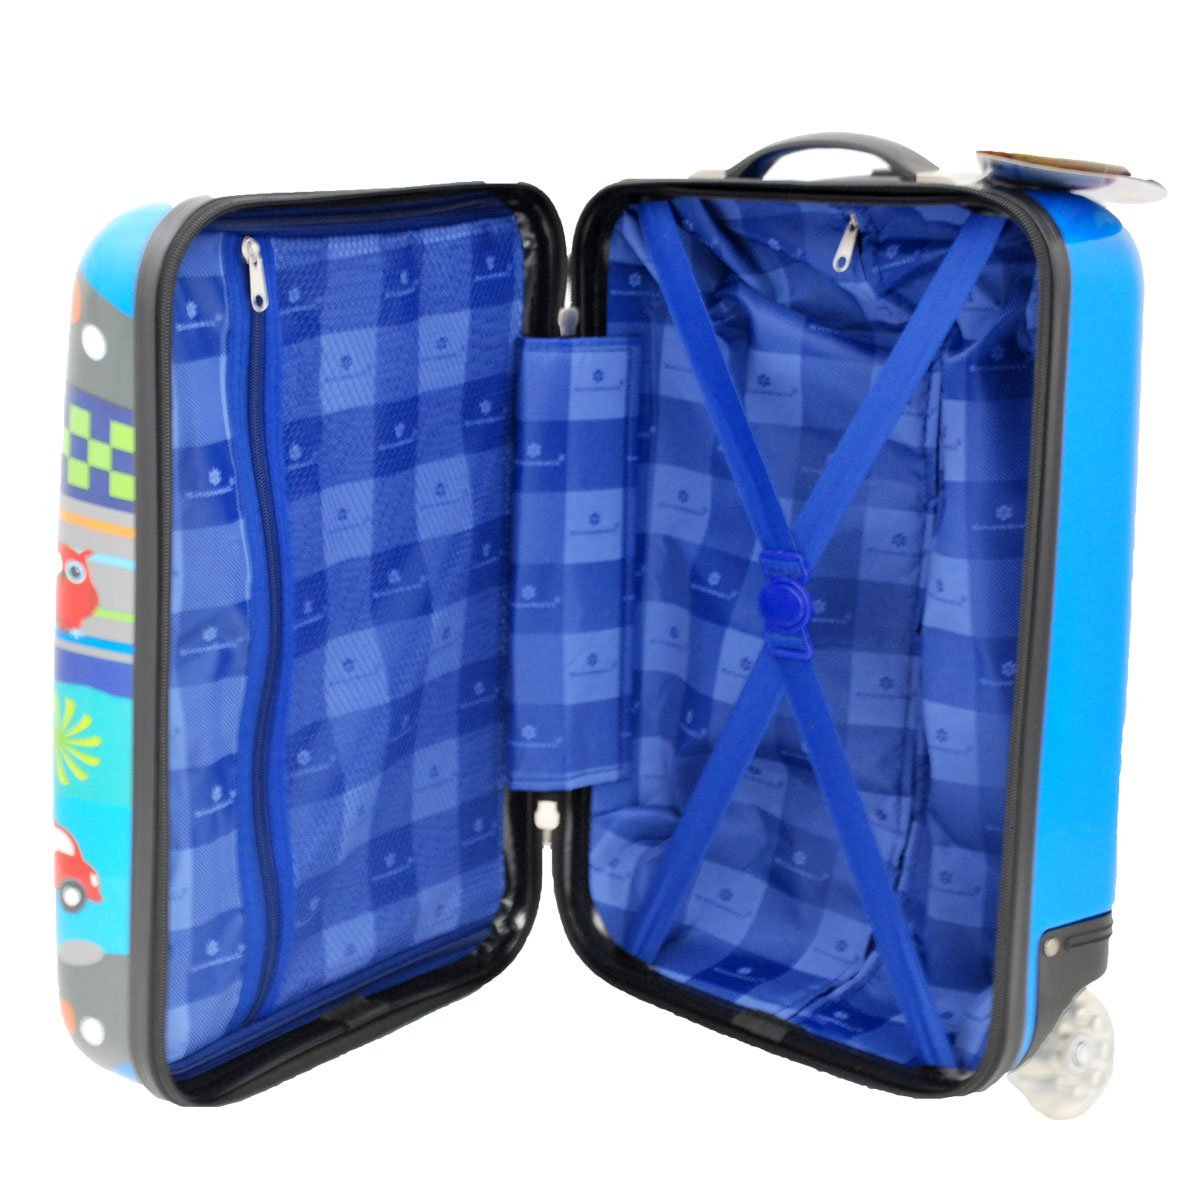 Valise cabine 50 cm Bleu Enfant Snowball